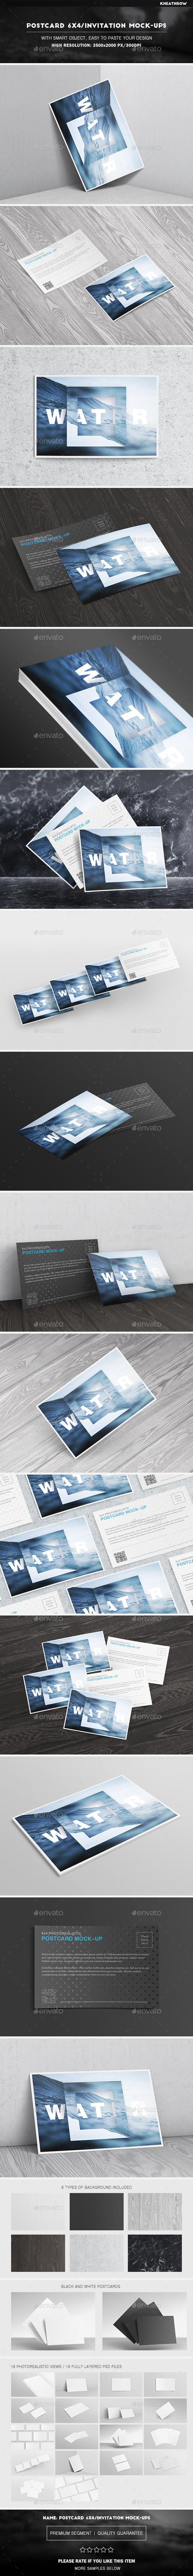 Postcard 6x4 / Invitation Mock-Ups - Miscellaneous Print